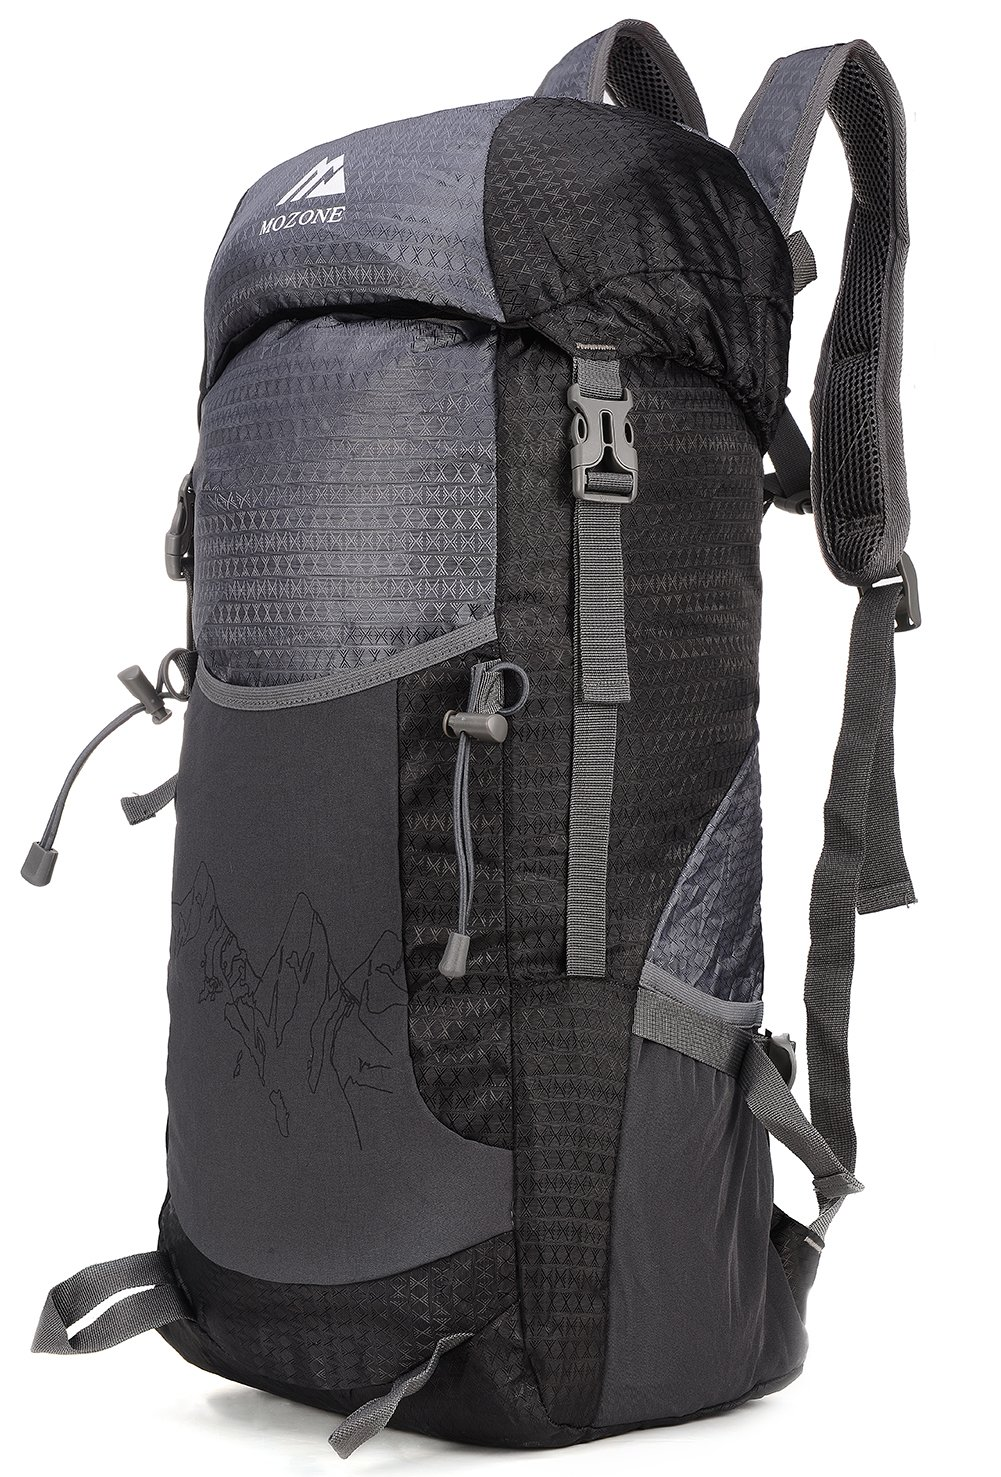 Amazon.com : Mozone Large 40l Lightweight Travel Backpack/foldable ...